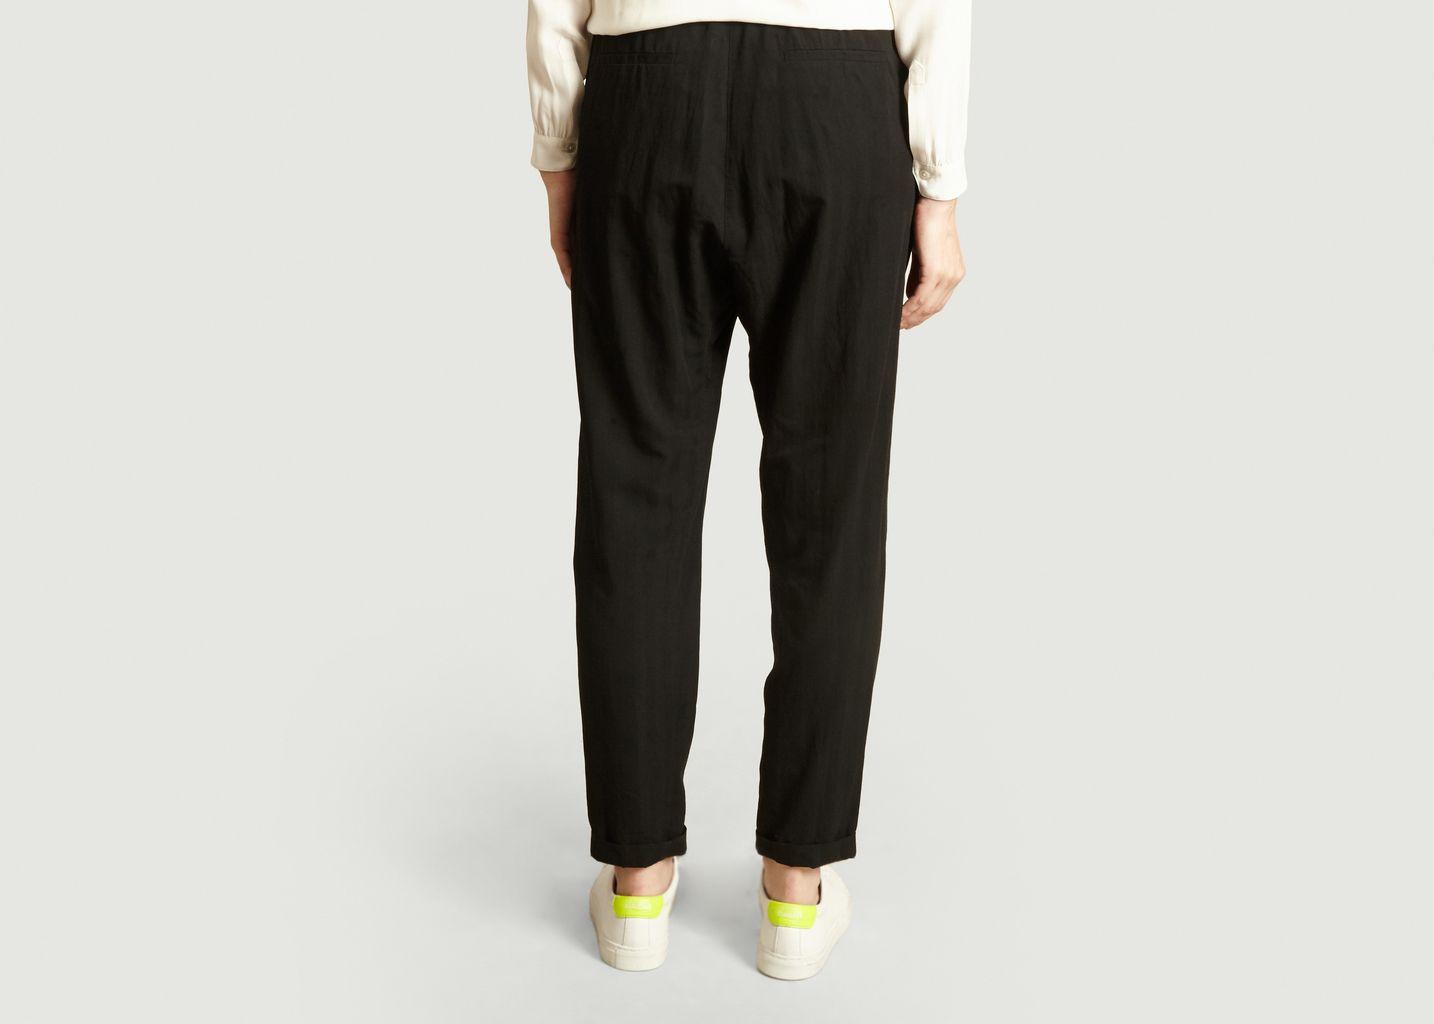 Pantalon avec cordon rayé Vael - Bellerose